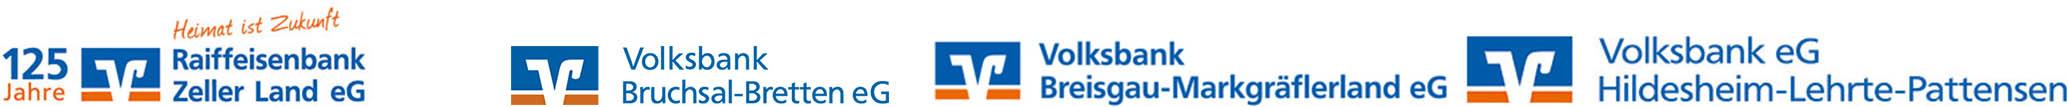 Raiffeisenbank Zeller Land eG - Volksbank Bruchsal-Bretten eG - Breisgrau-Markgräflerland eG - Hildesheim-Lehrte-Pattensen